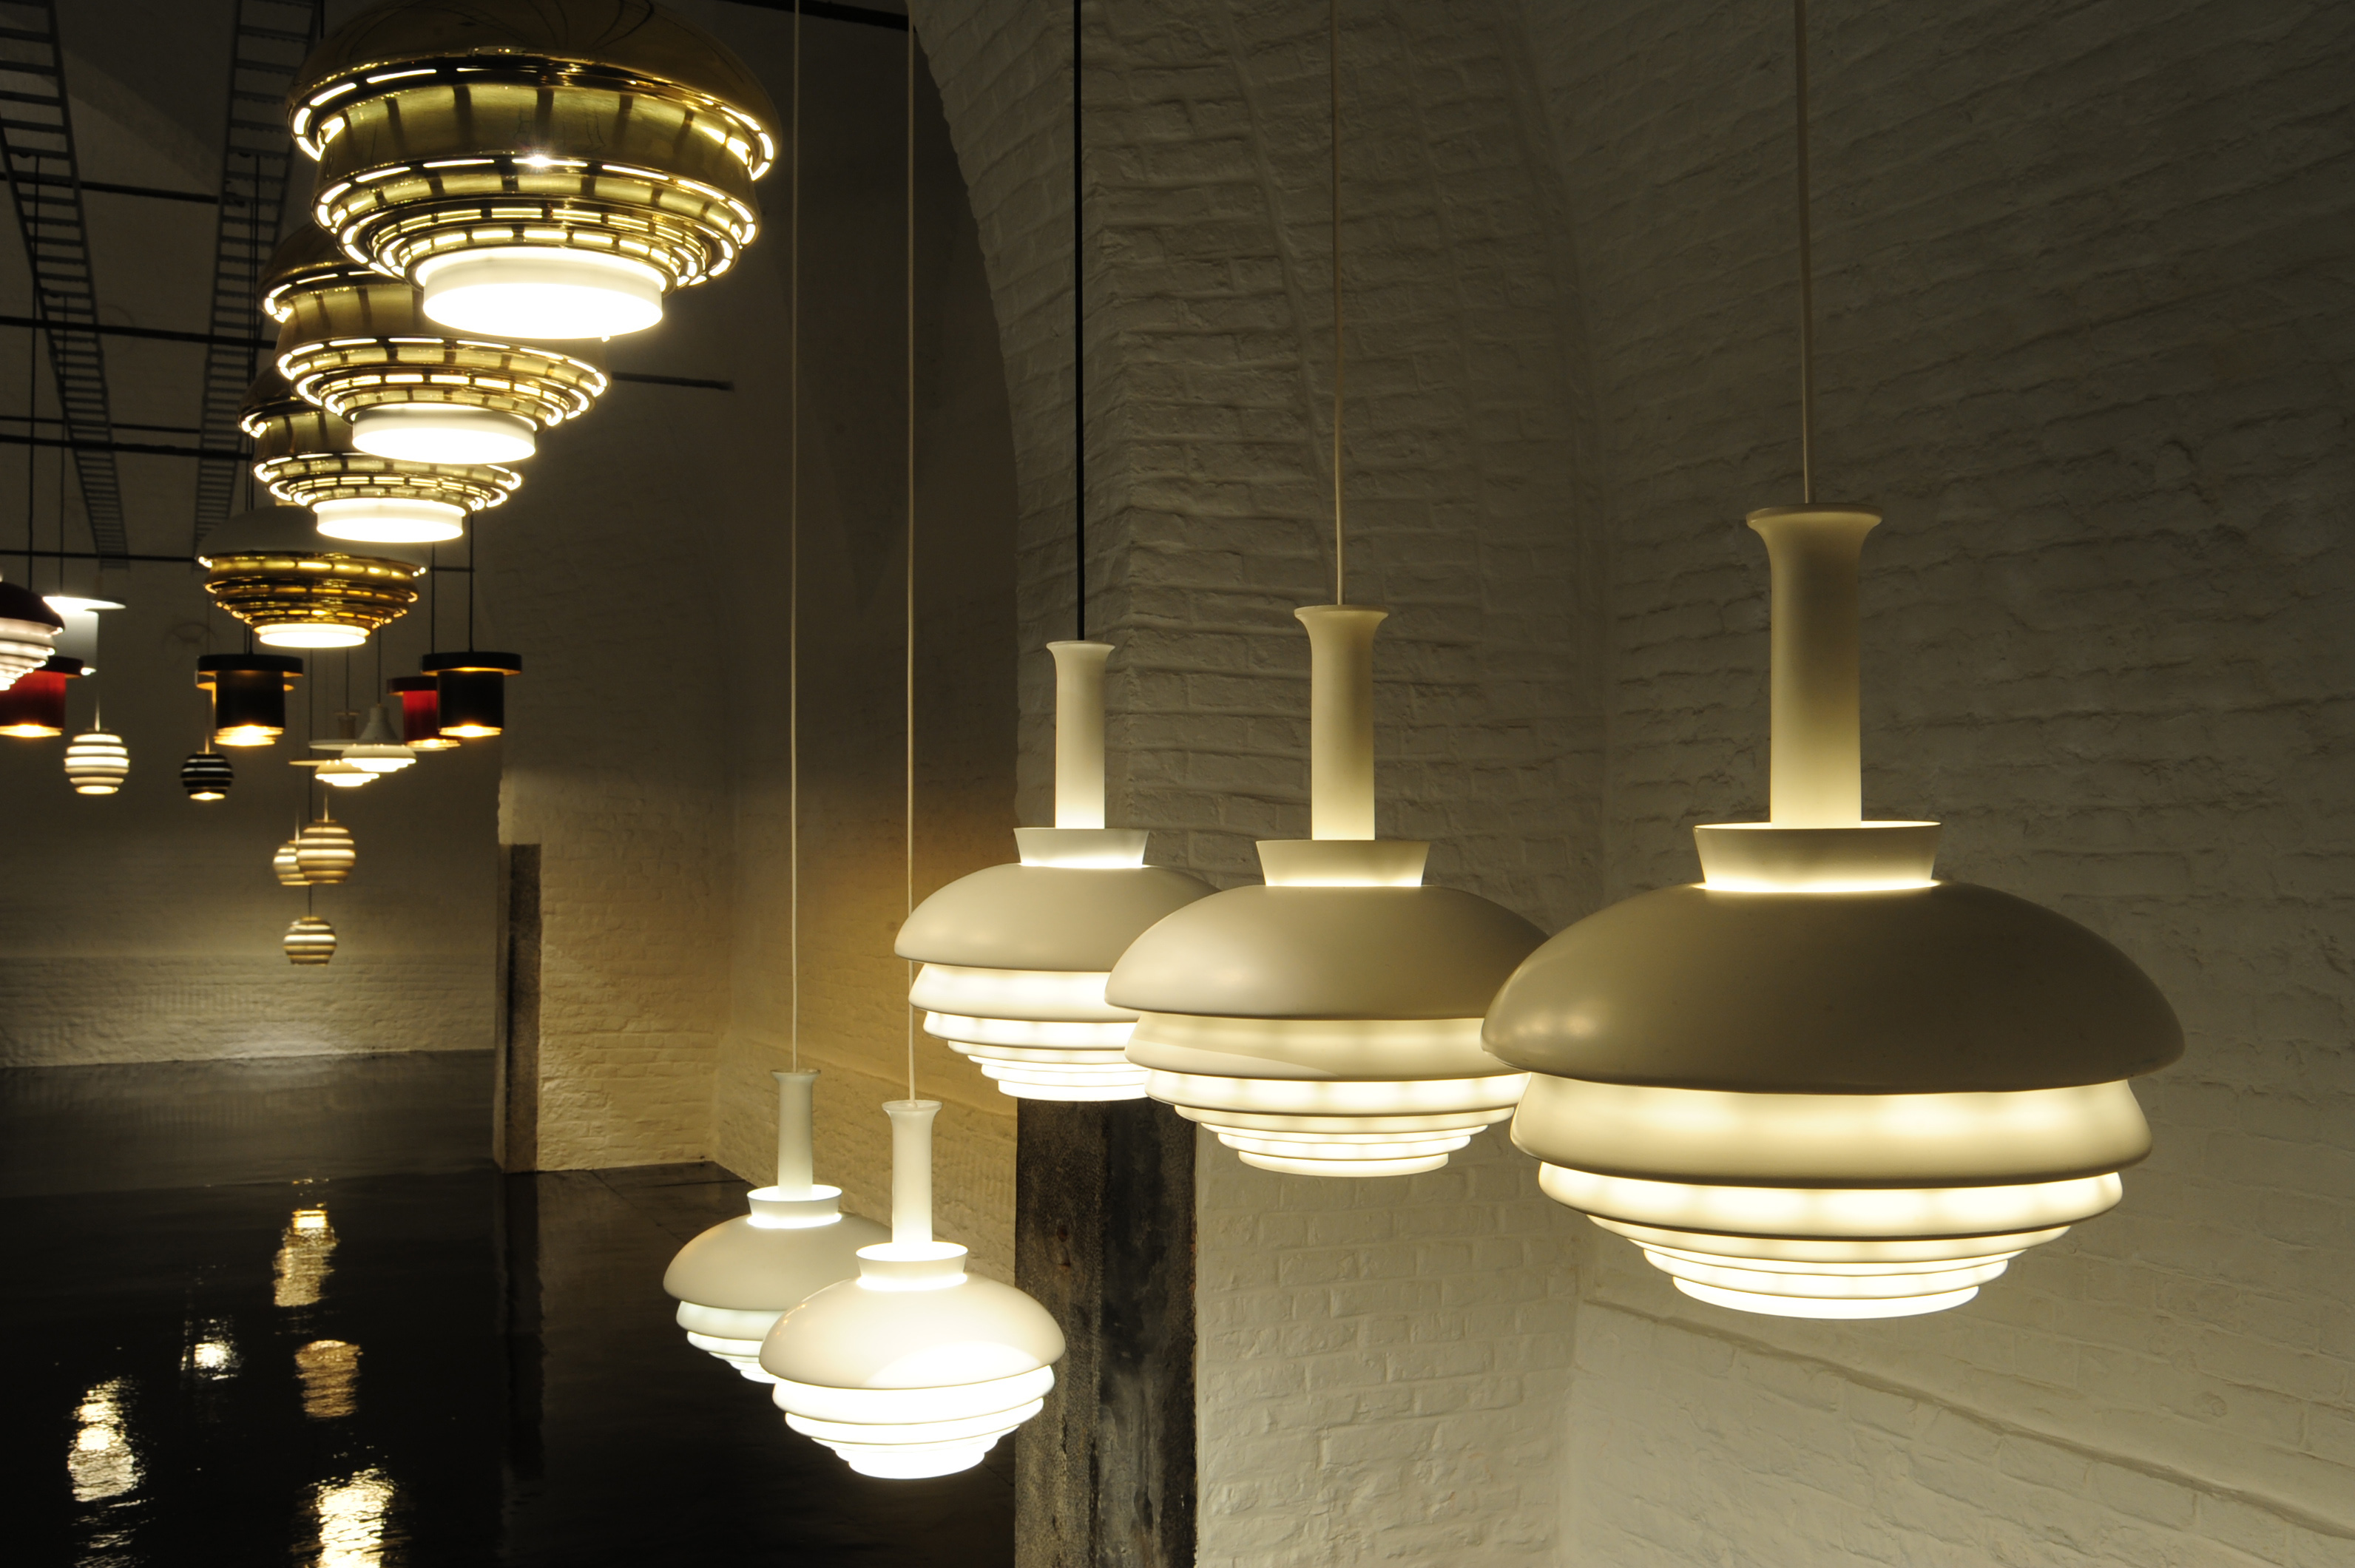 new show sheds light on alvar aalto | architecture | agenda | phaidon